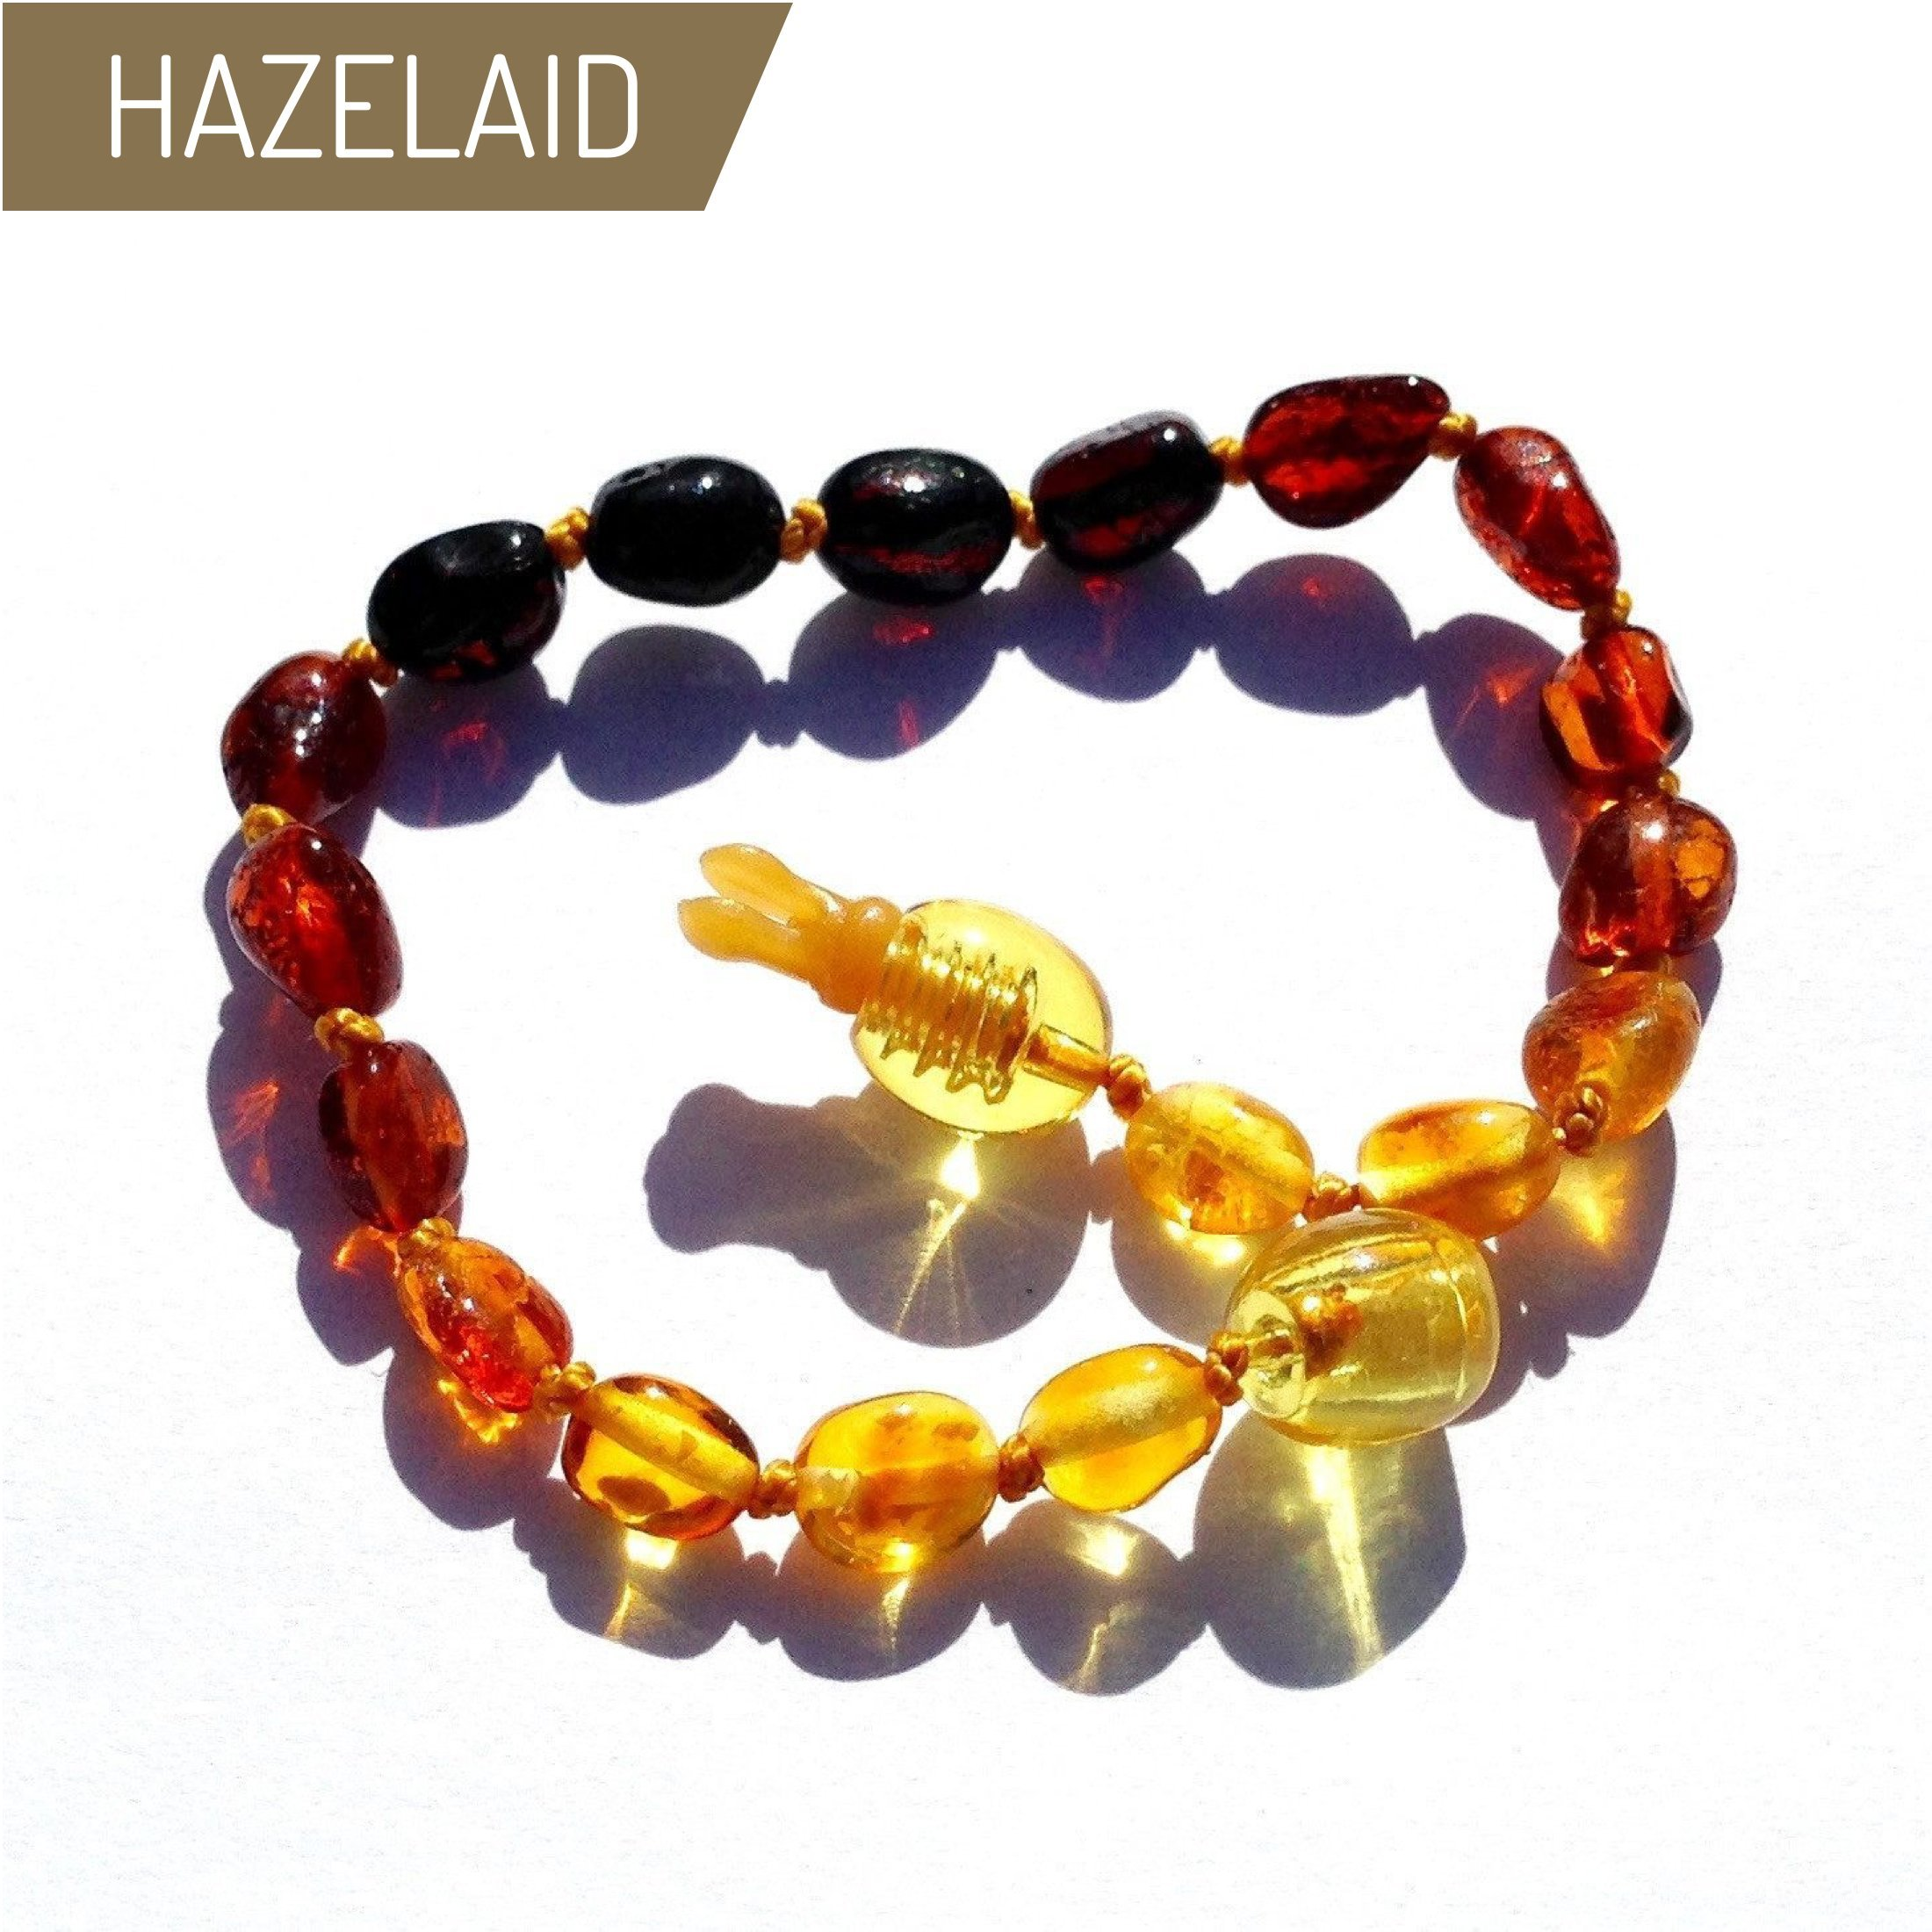 Hazelaid (TM) 5.5'' Pop-Clasp Baltic Amber Rainbow Bean Bracelet